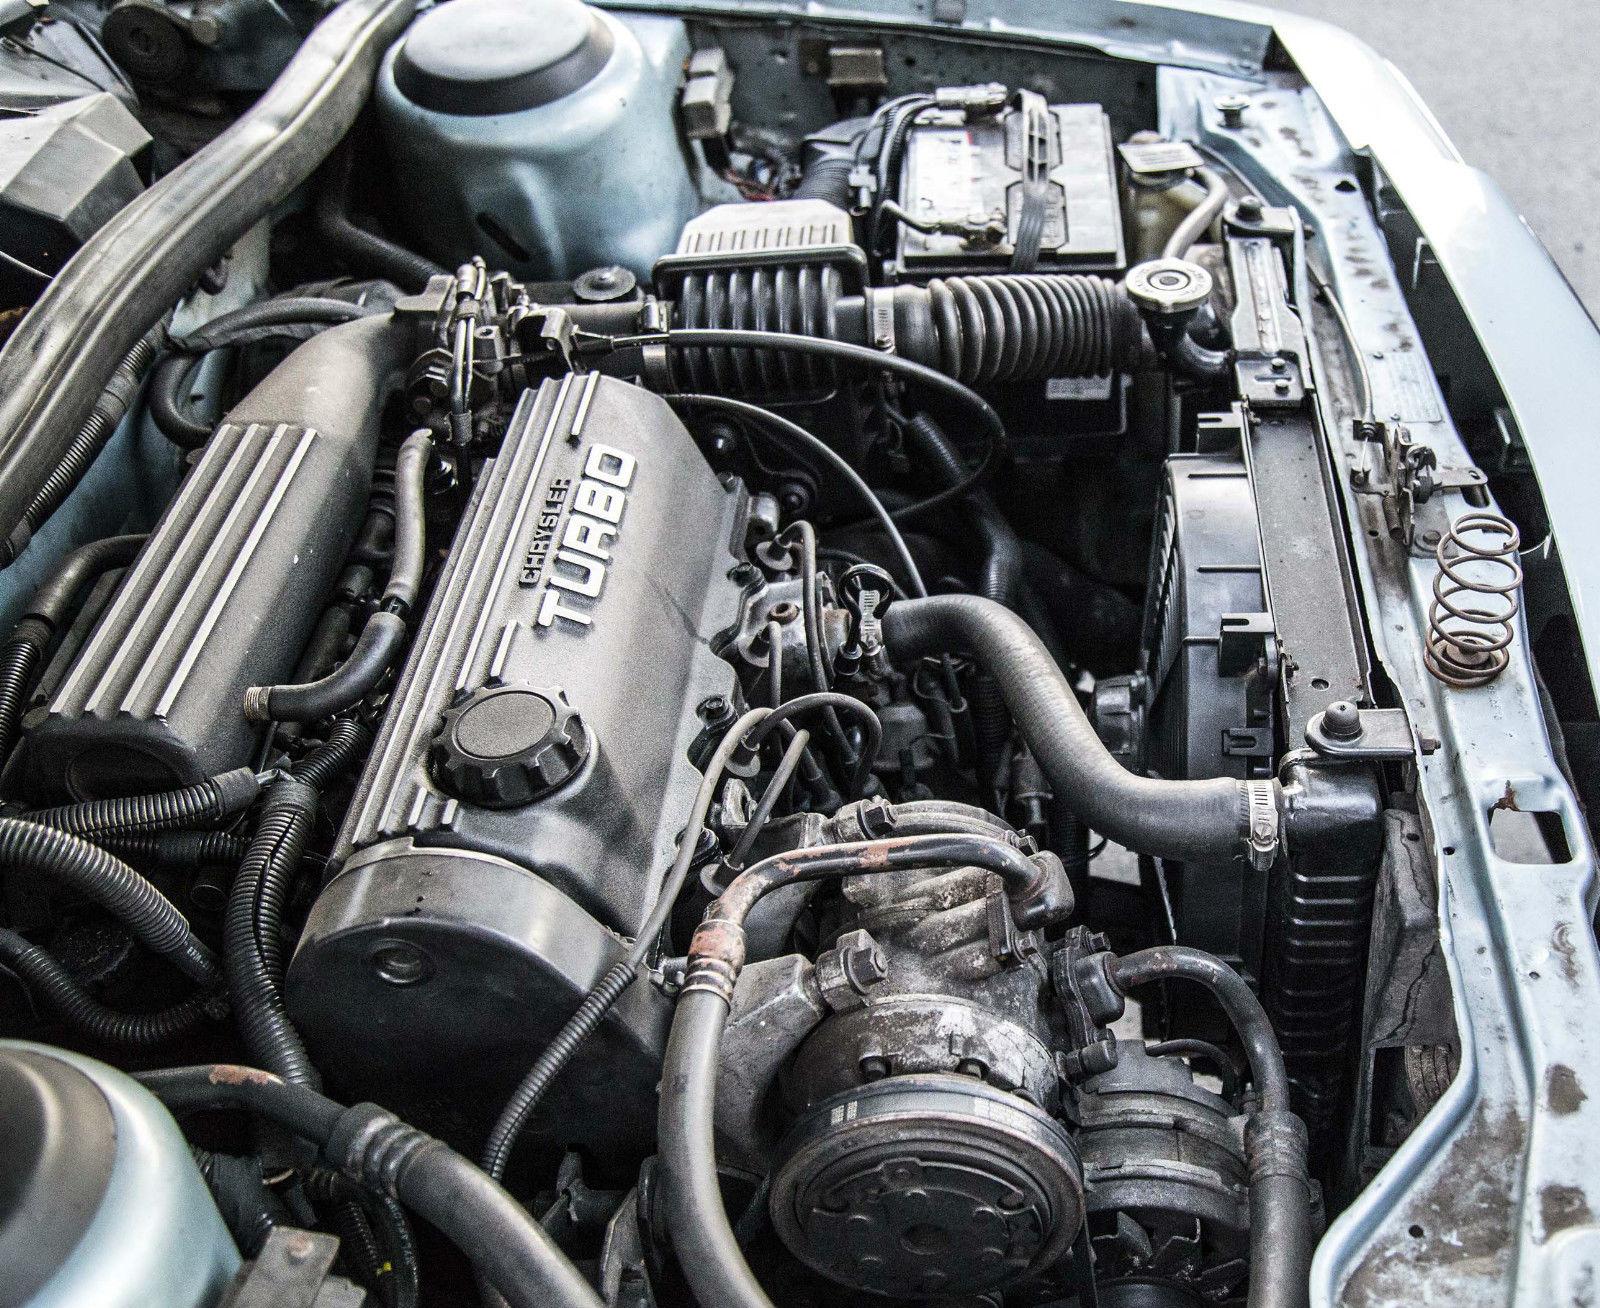 For Sale  Plymouth Reliant Wagon With A Turbo I4  U2013 Engine